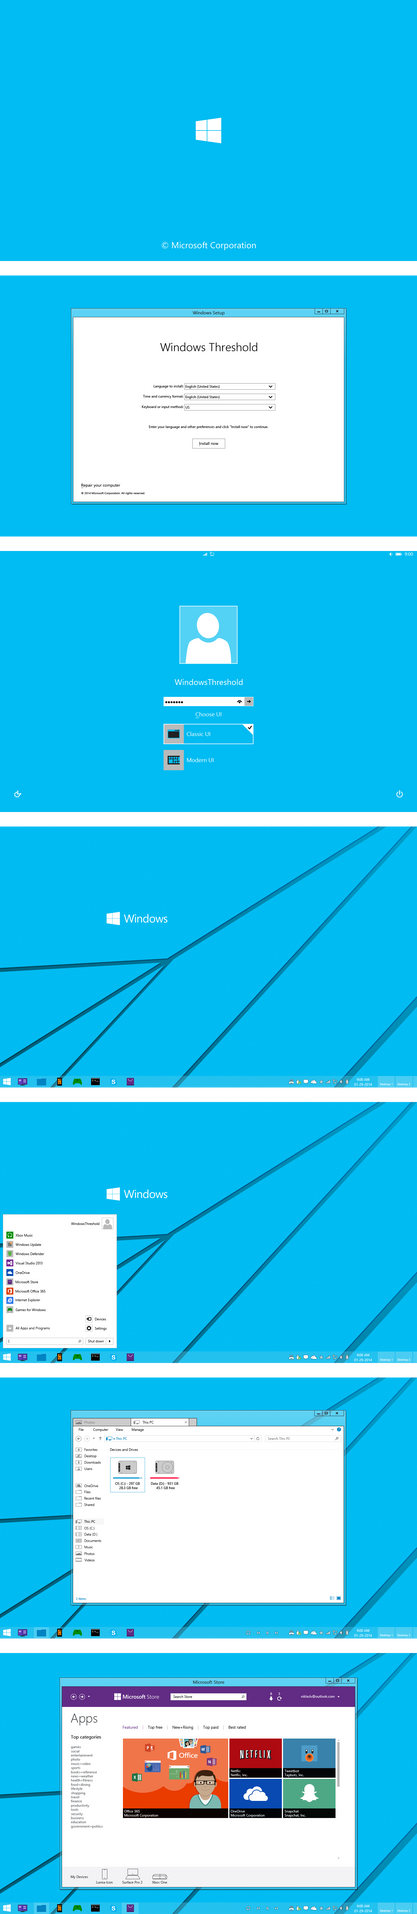 Windows 9  / Threshold - Classic UI by nik255